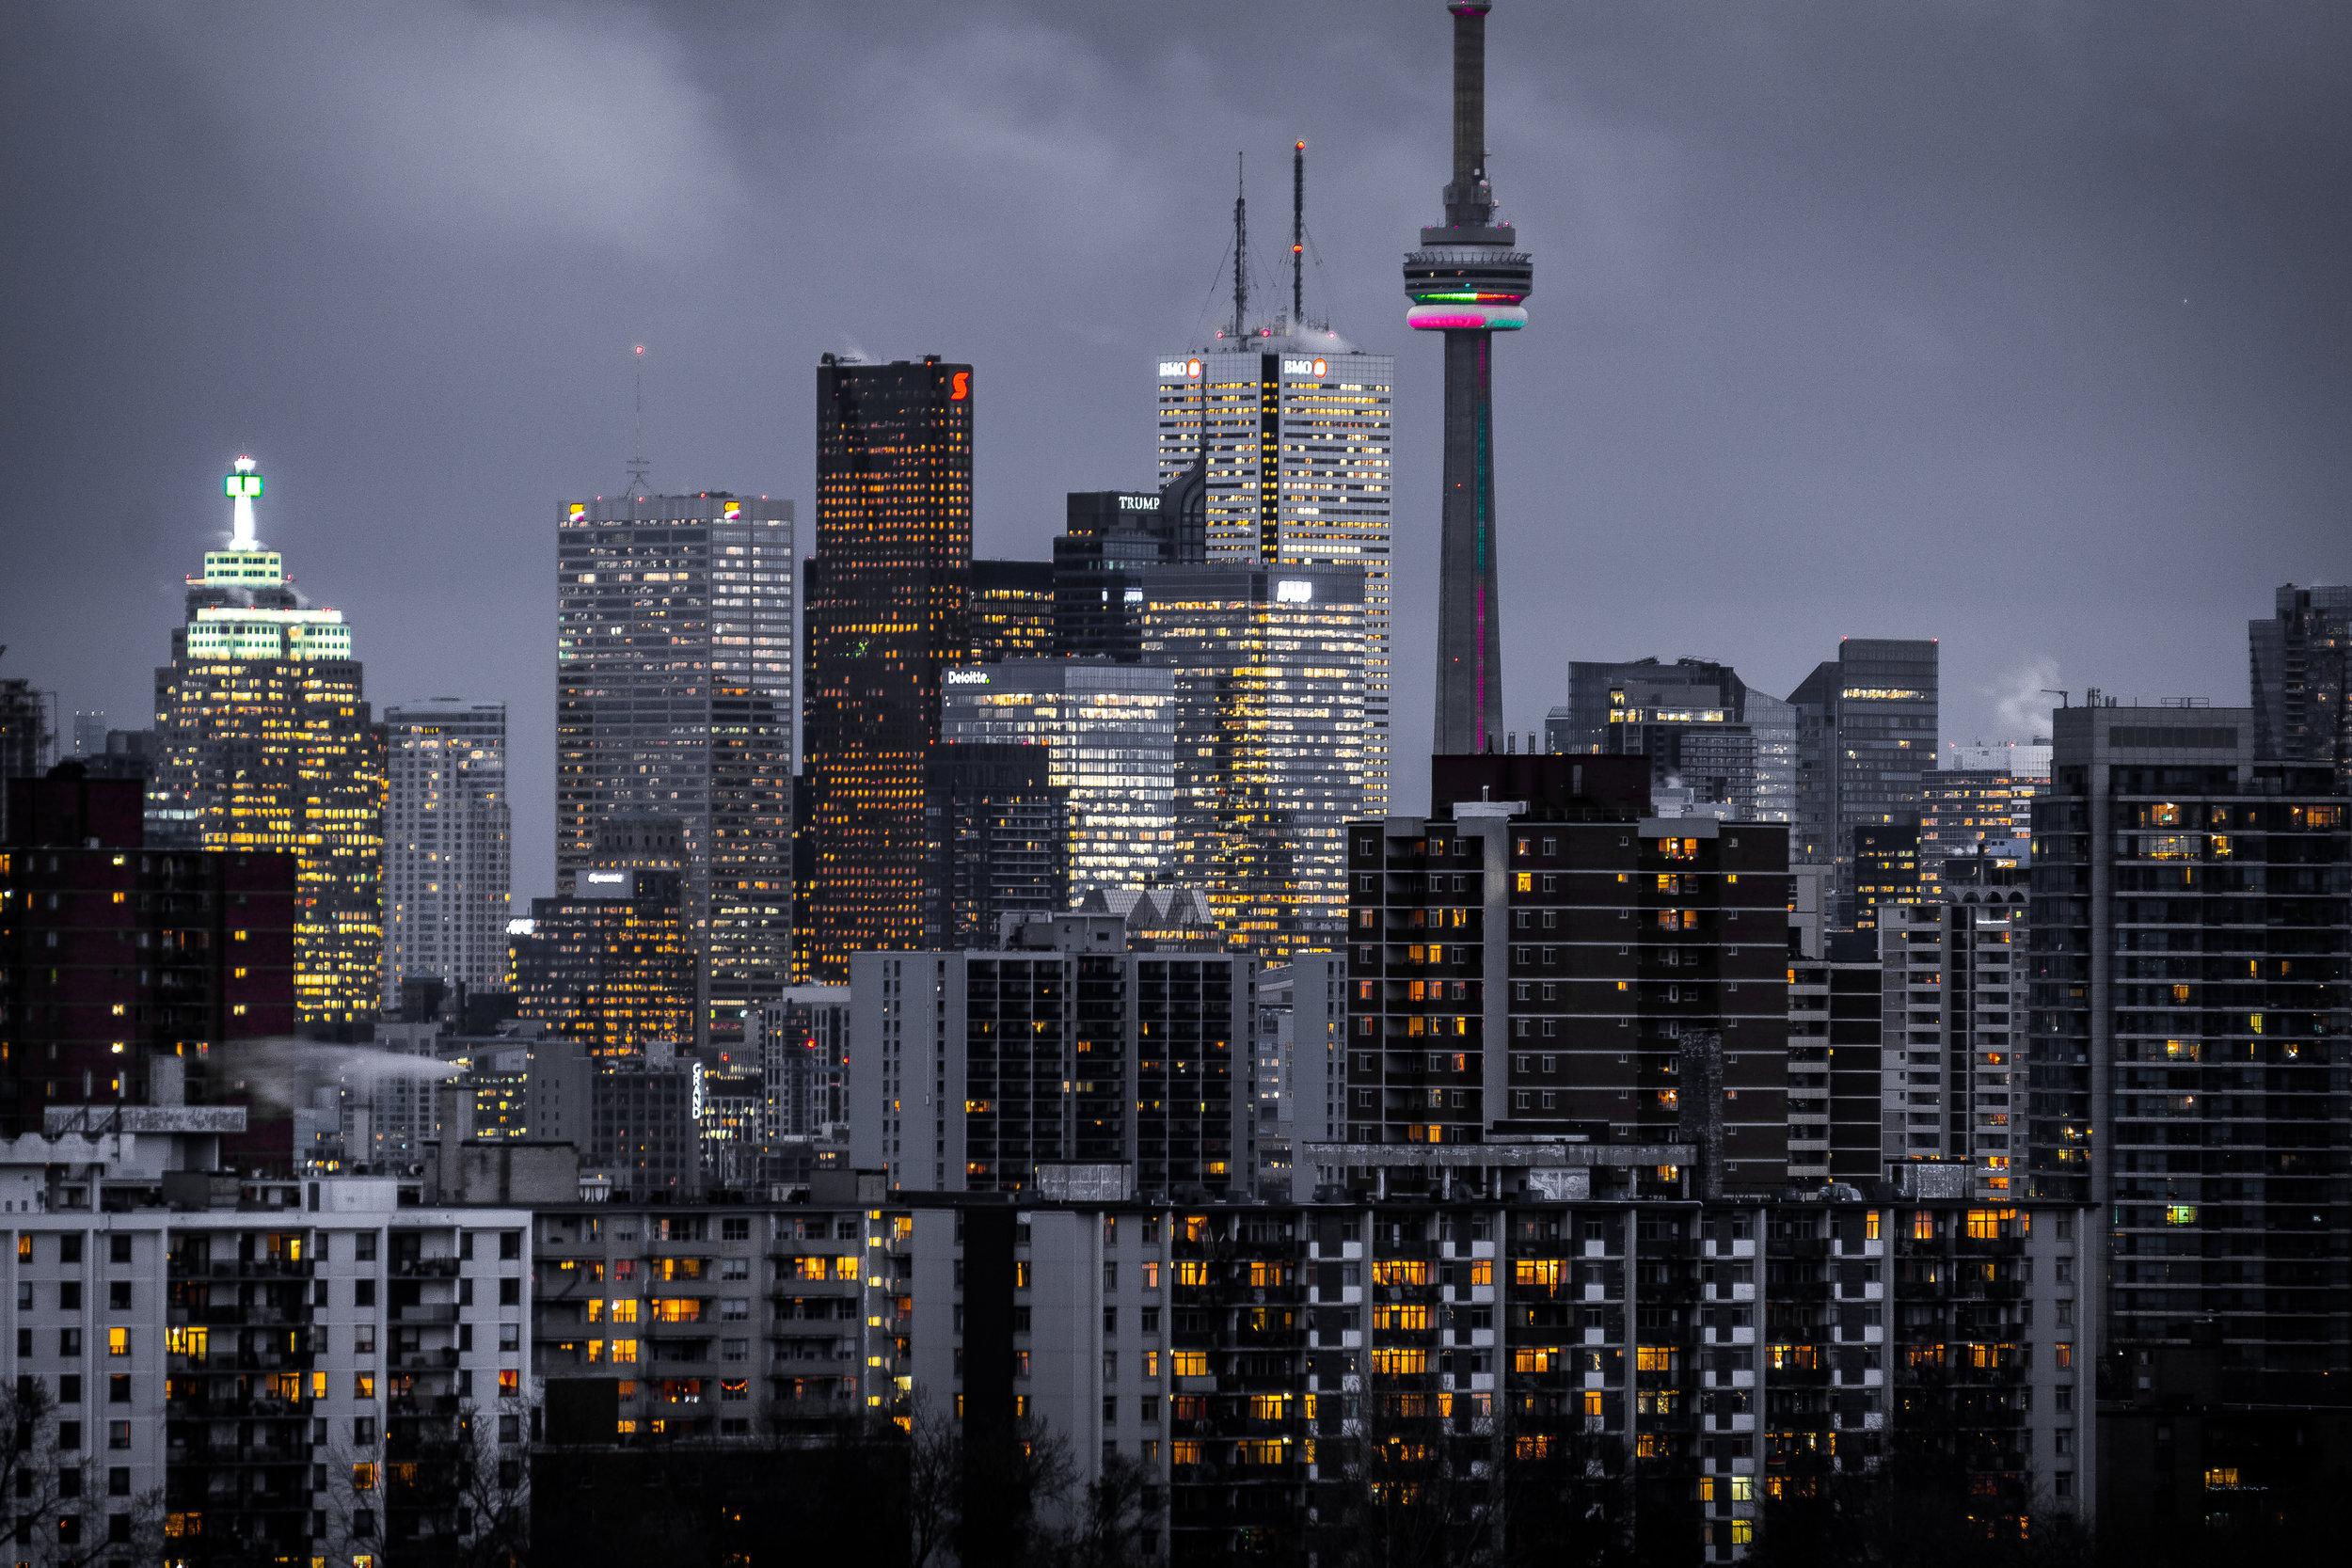 Toronto - HackingHR Forum: November 29, 2018